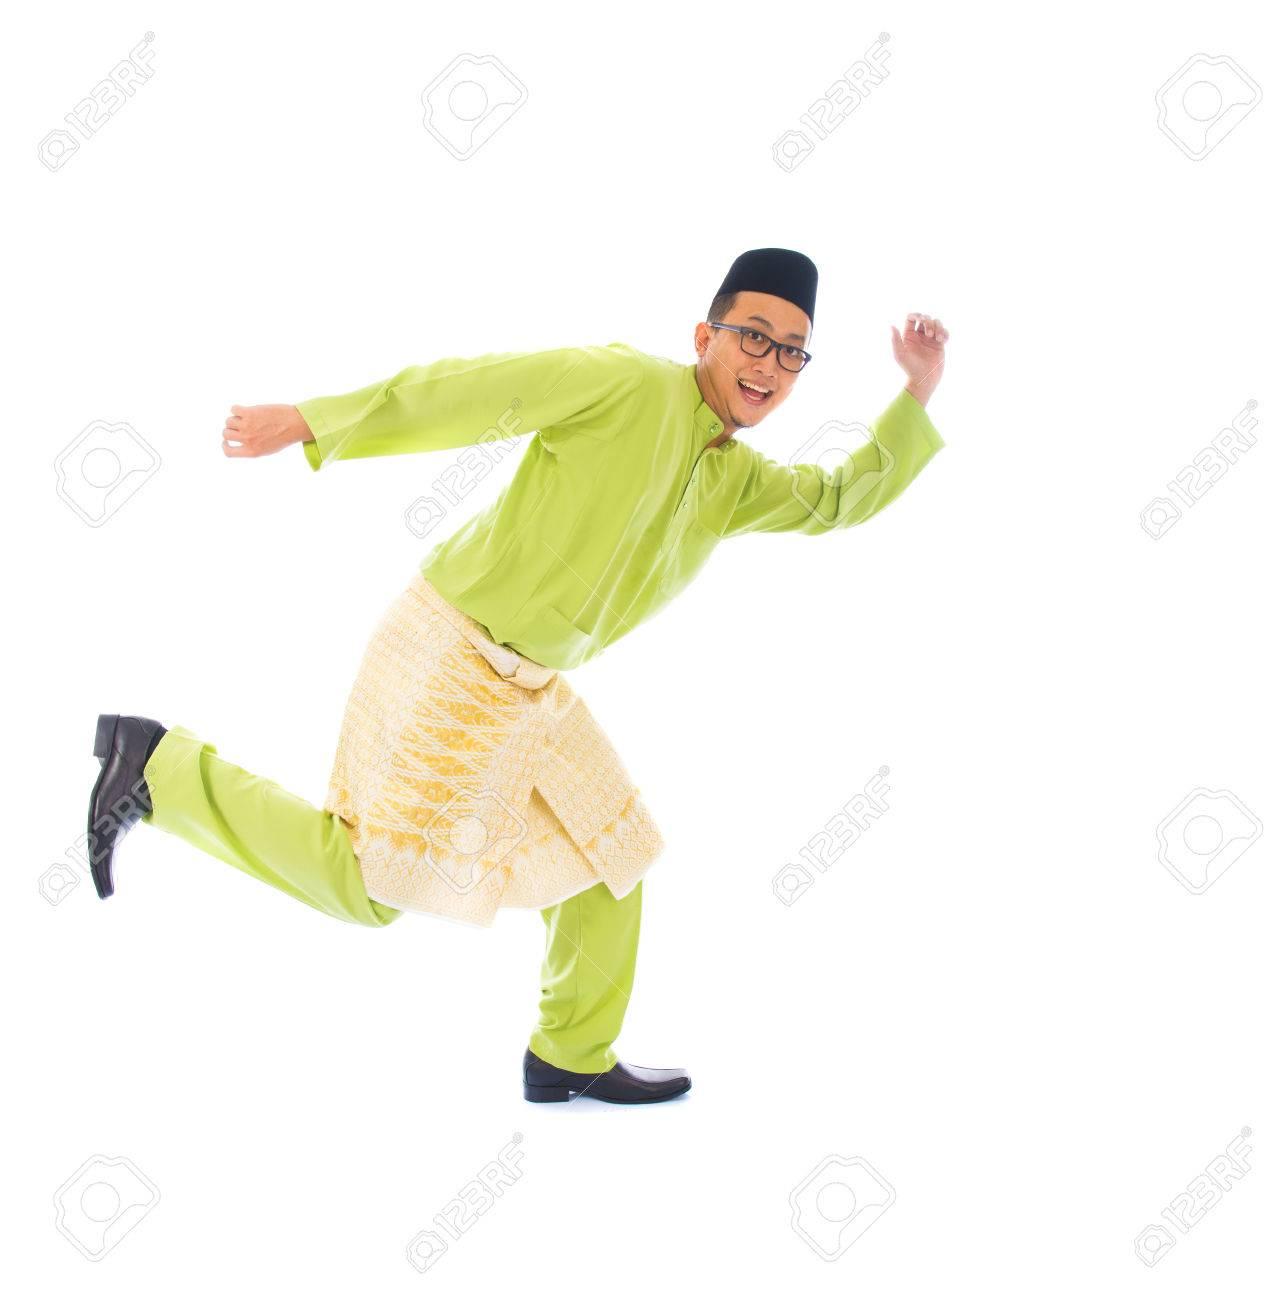 malay male jumping celebrating hari raya eid fitr after ramadan Stock Photo - 29822897